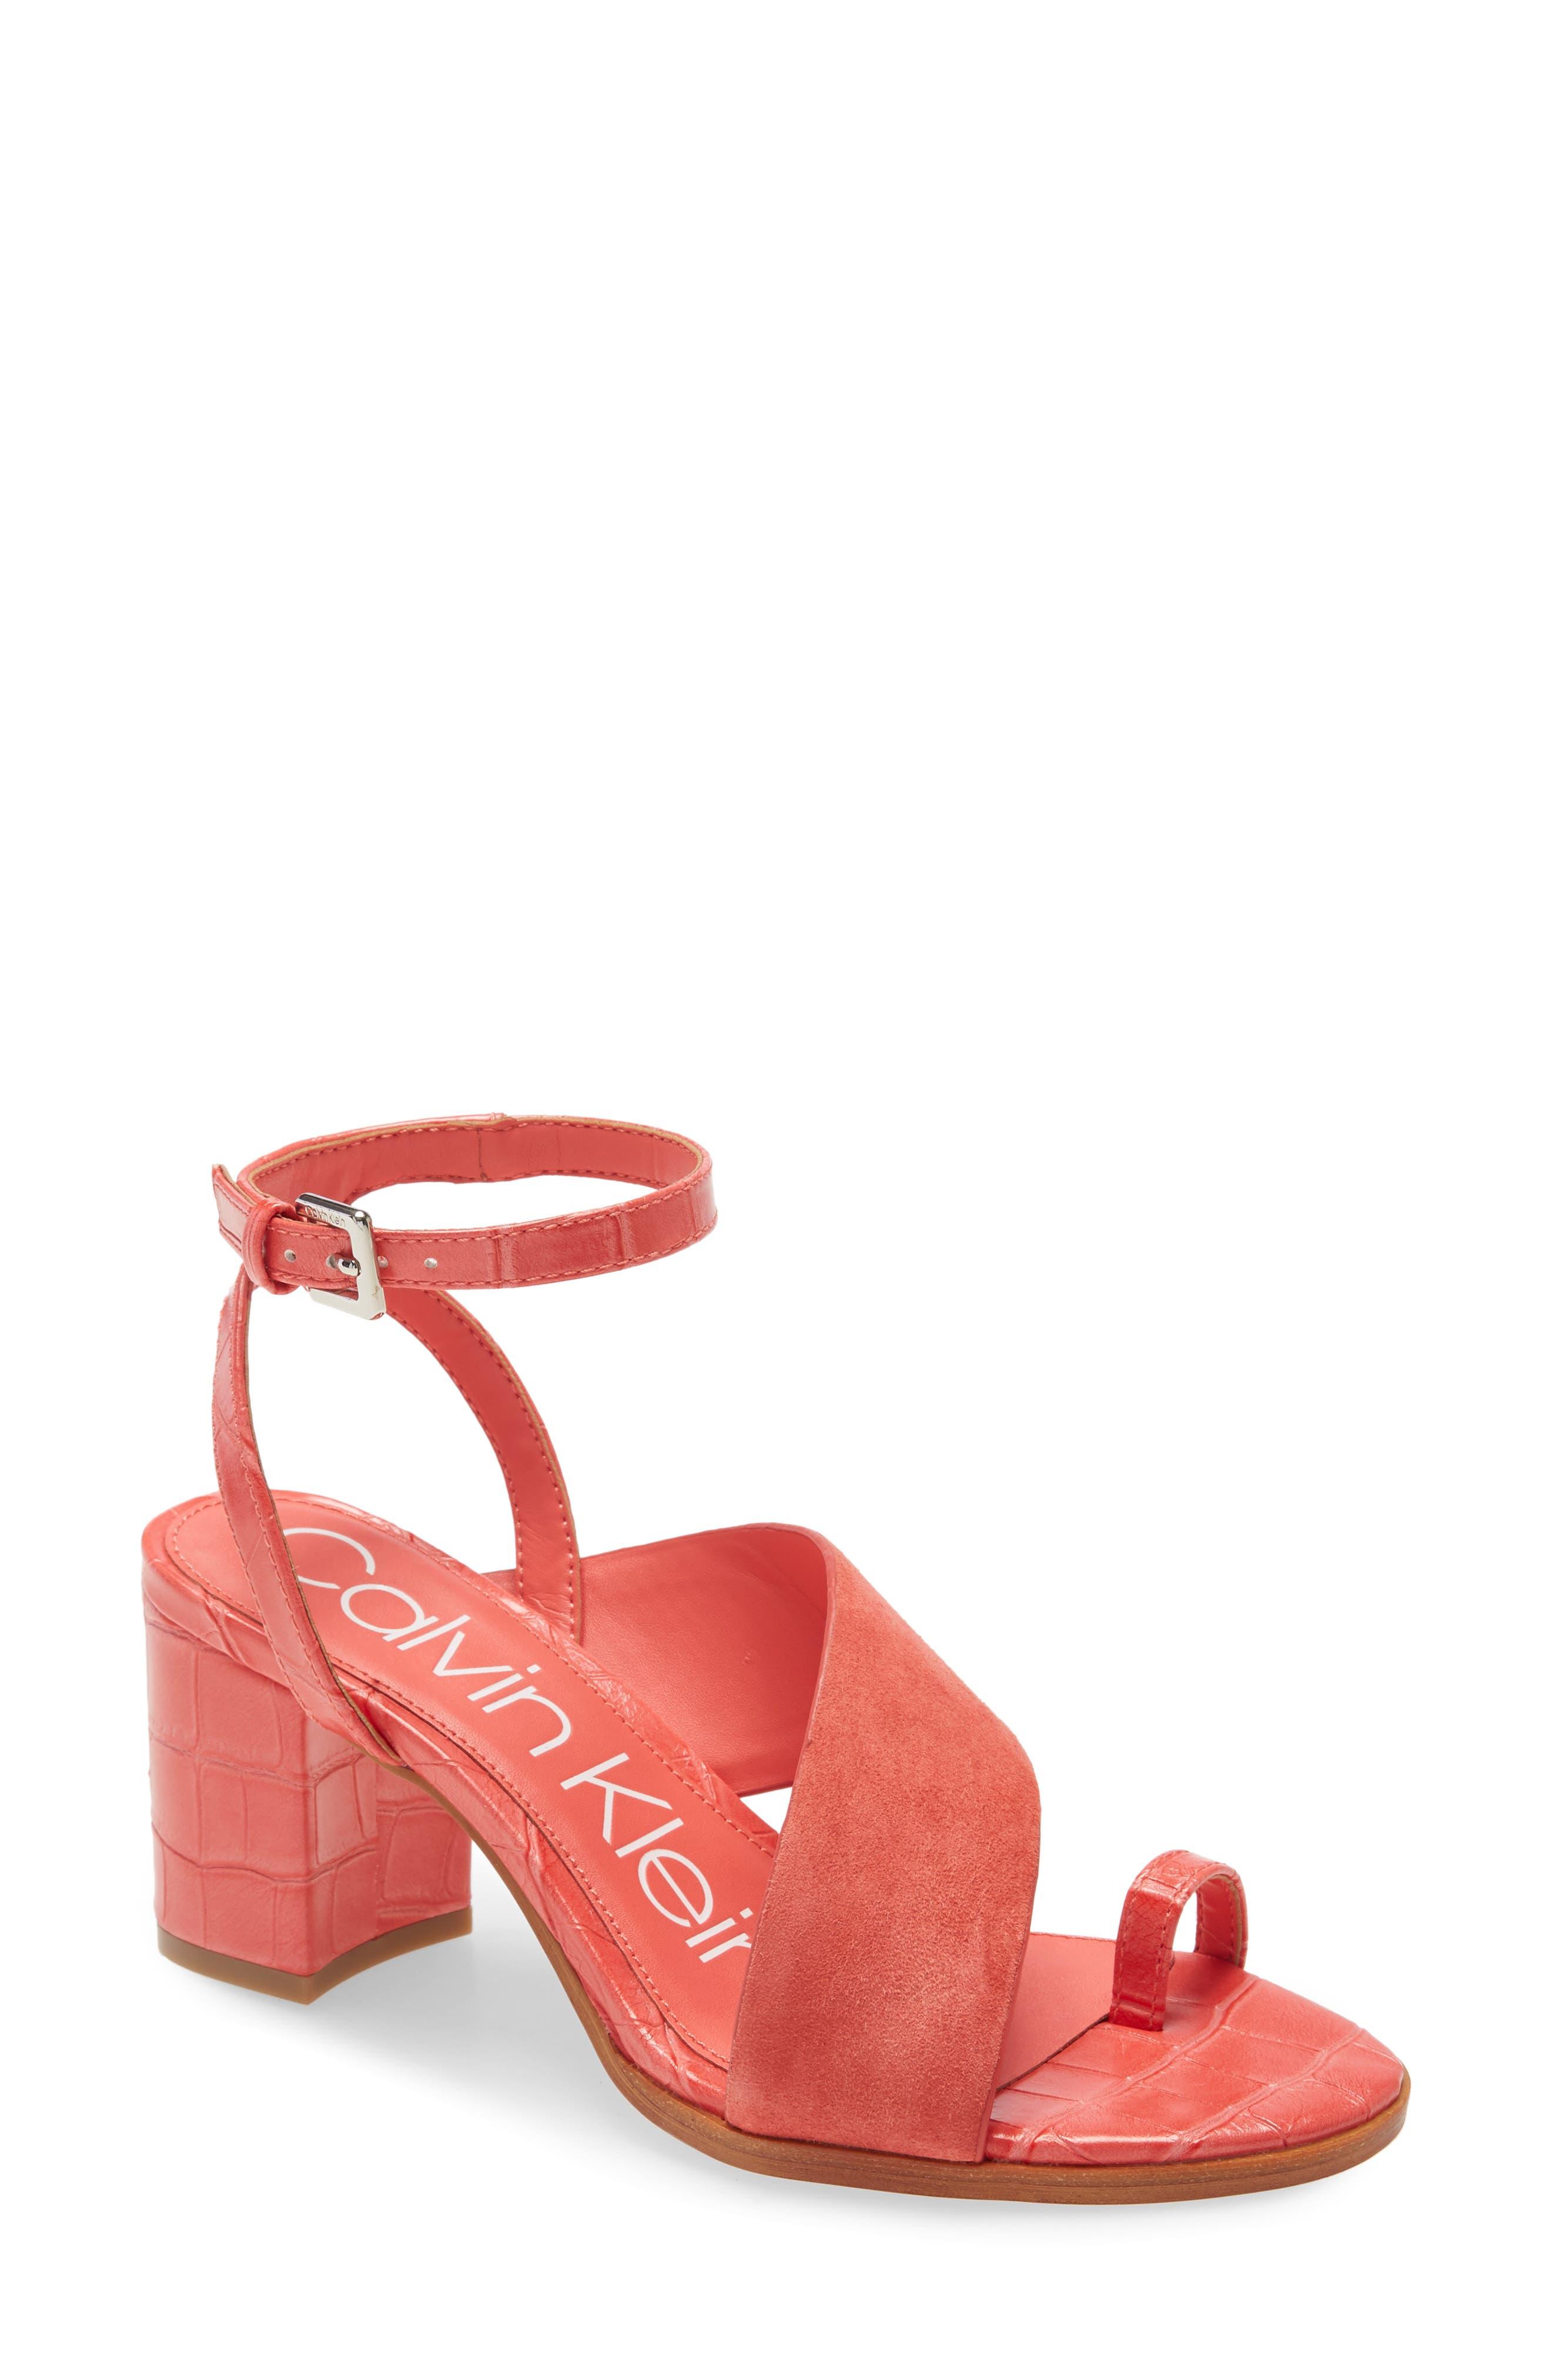 Women's Calvin Klein Shoes   Nordstrom